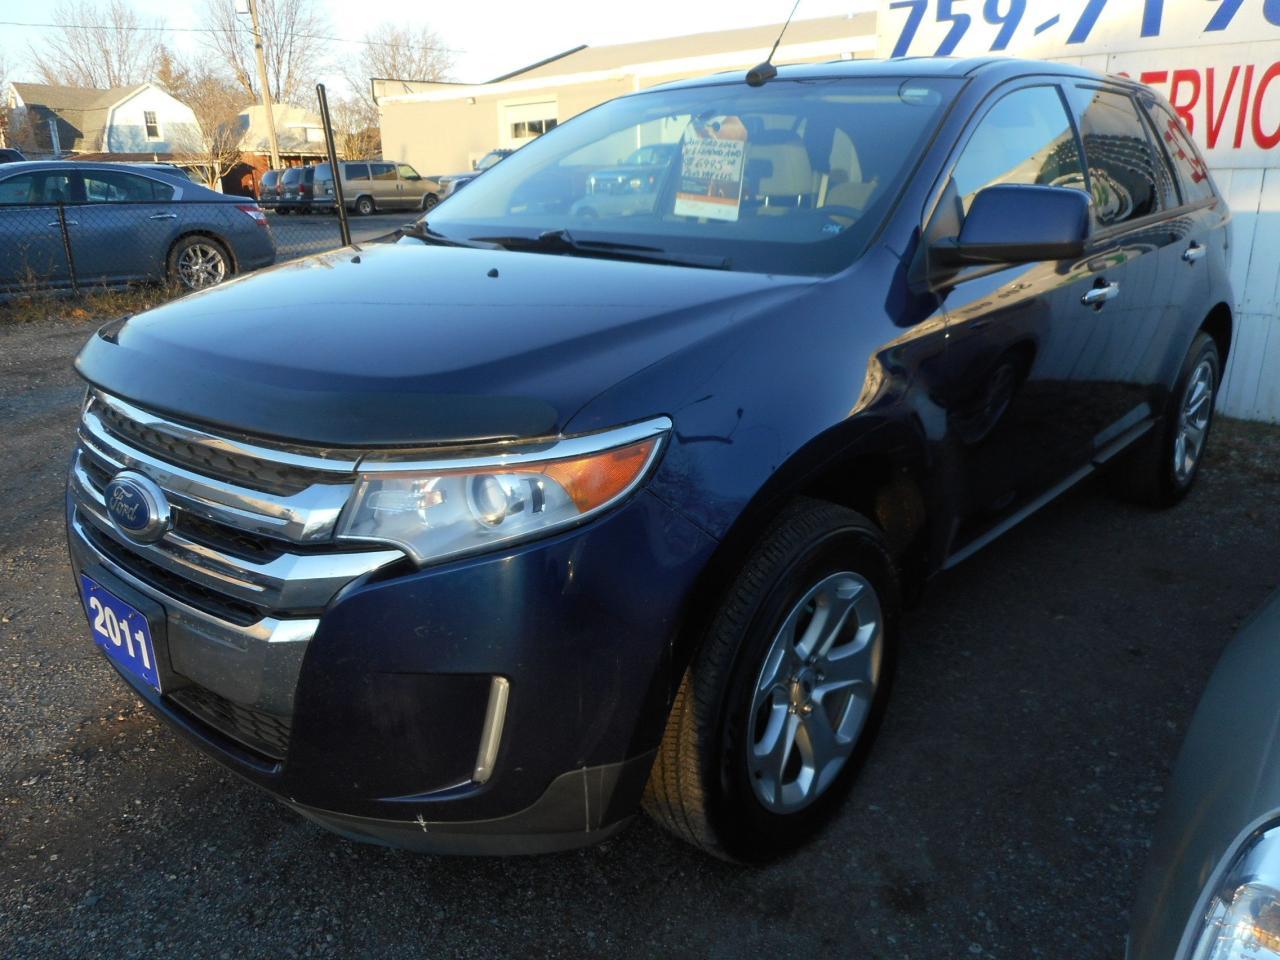 2011 Ford Edge Clean Carproof - Certified w/ 6 Month Warranty